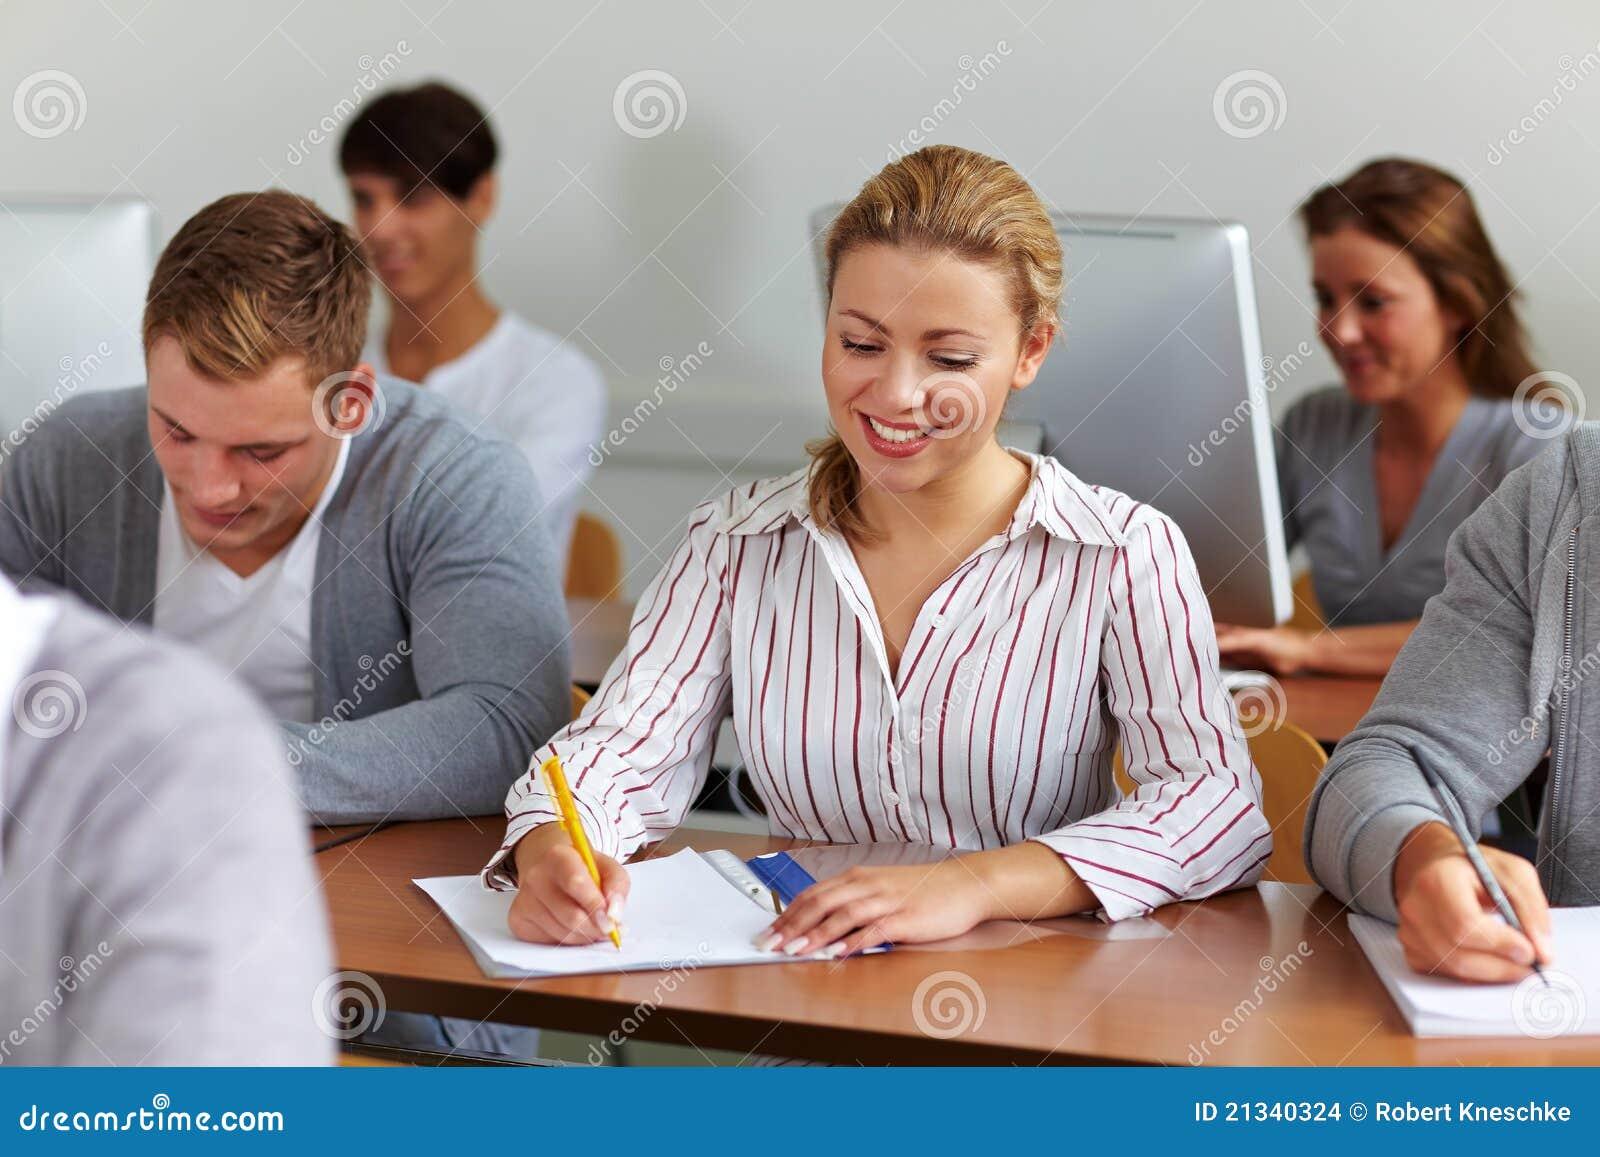 Happy Female Student Taking Notes Stock Images - Image ...